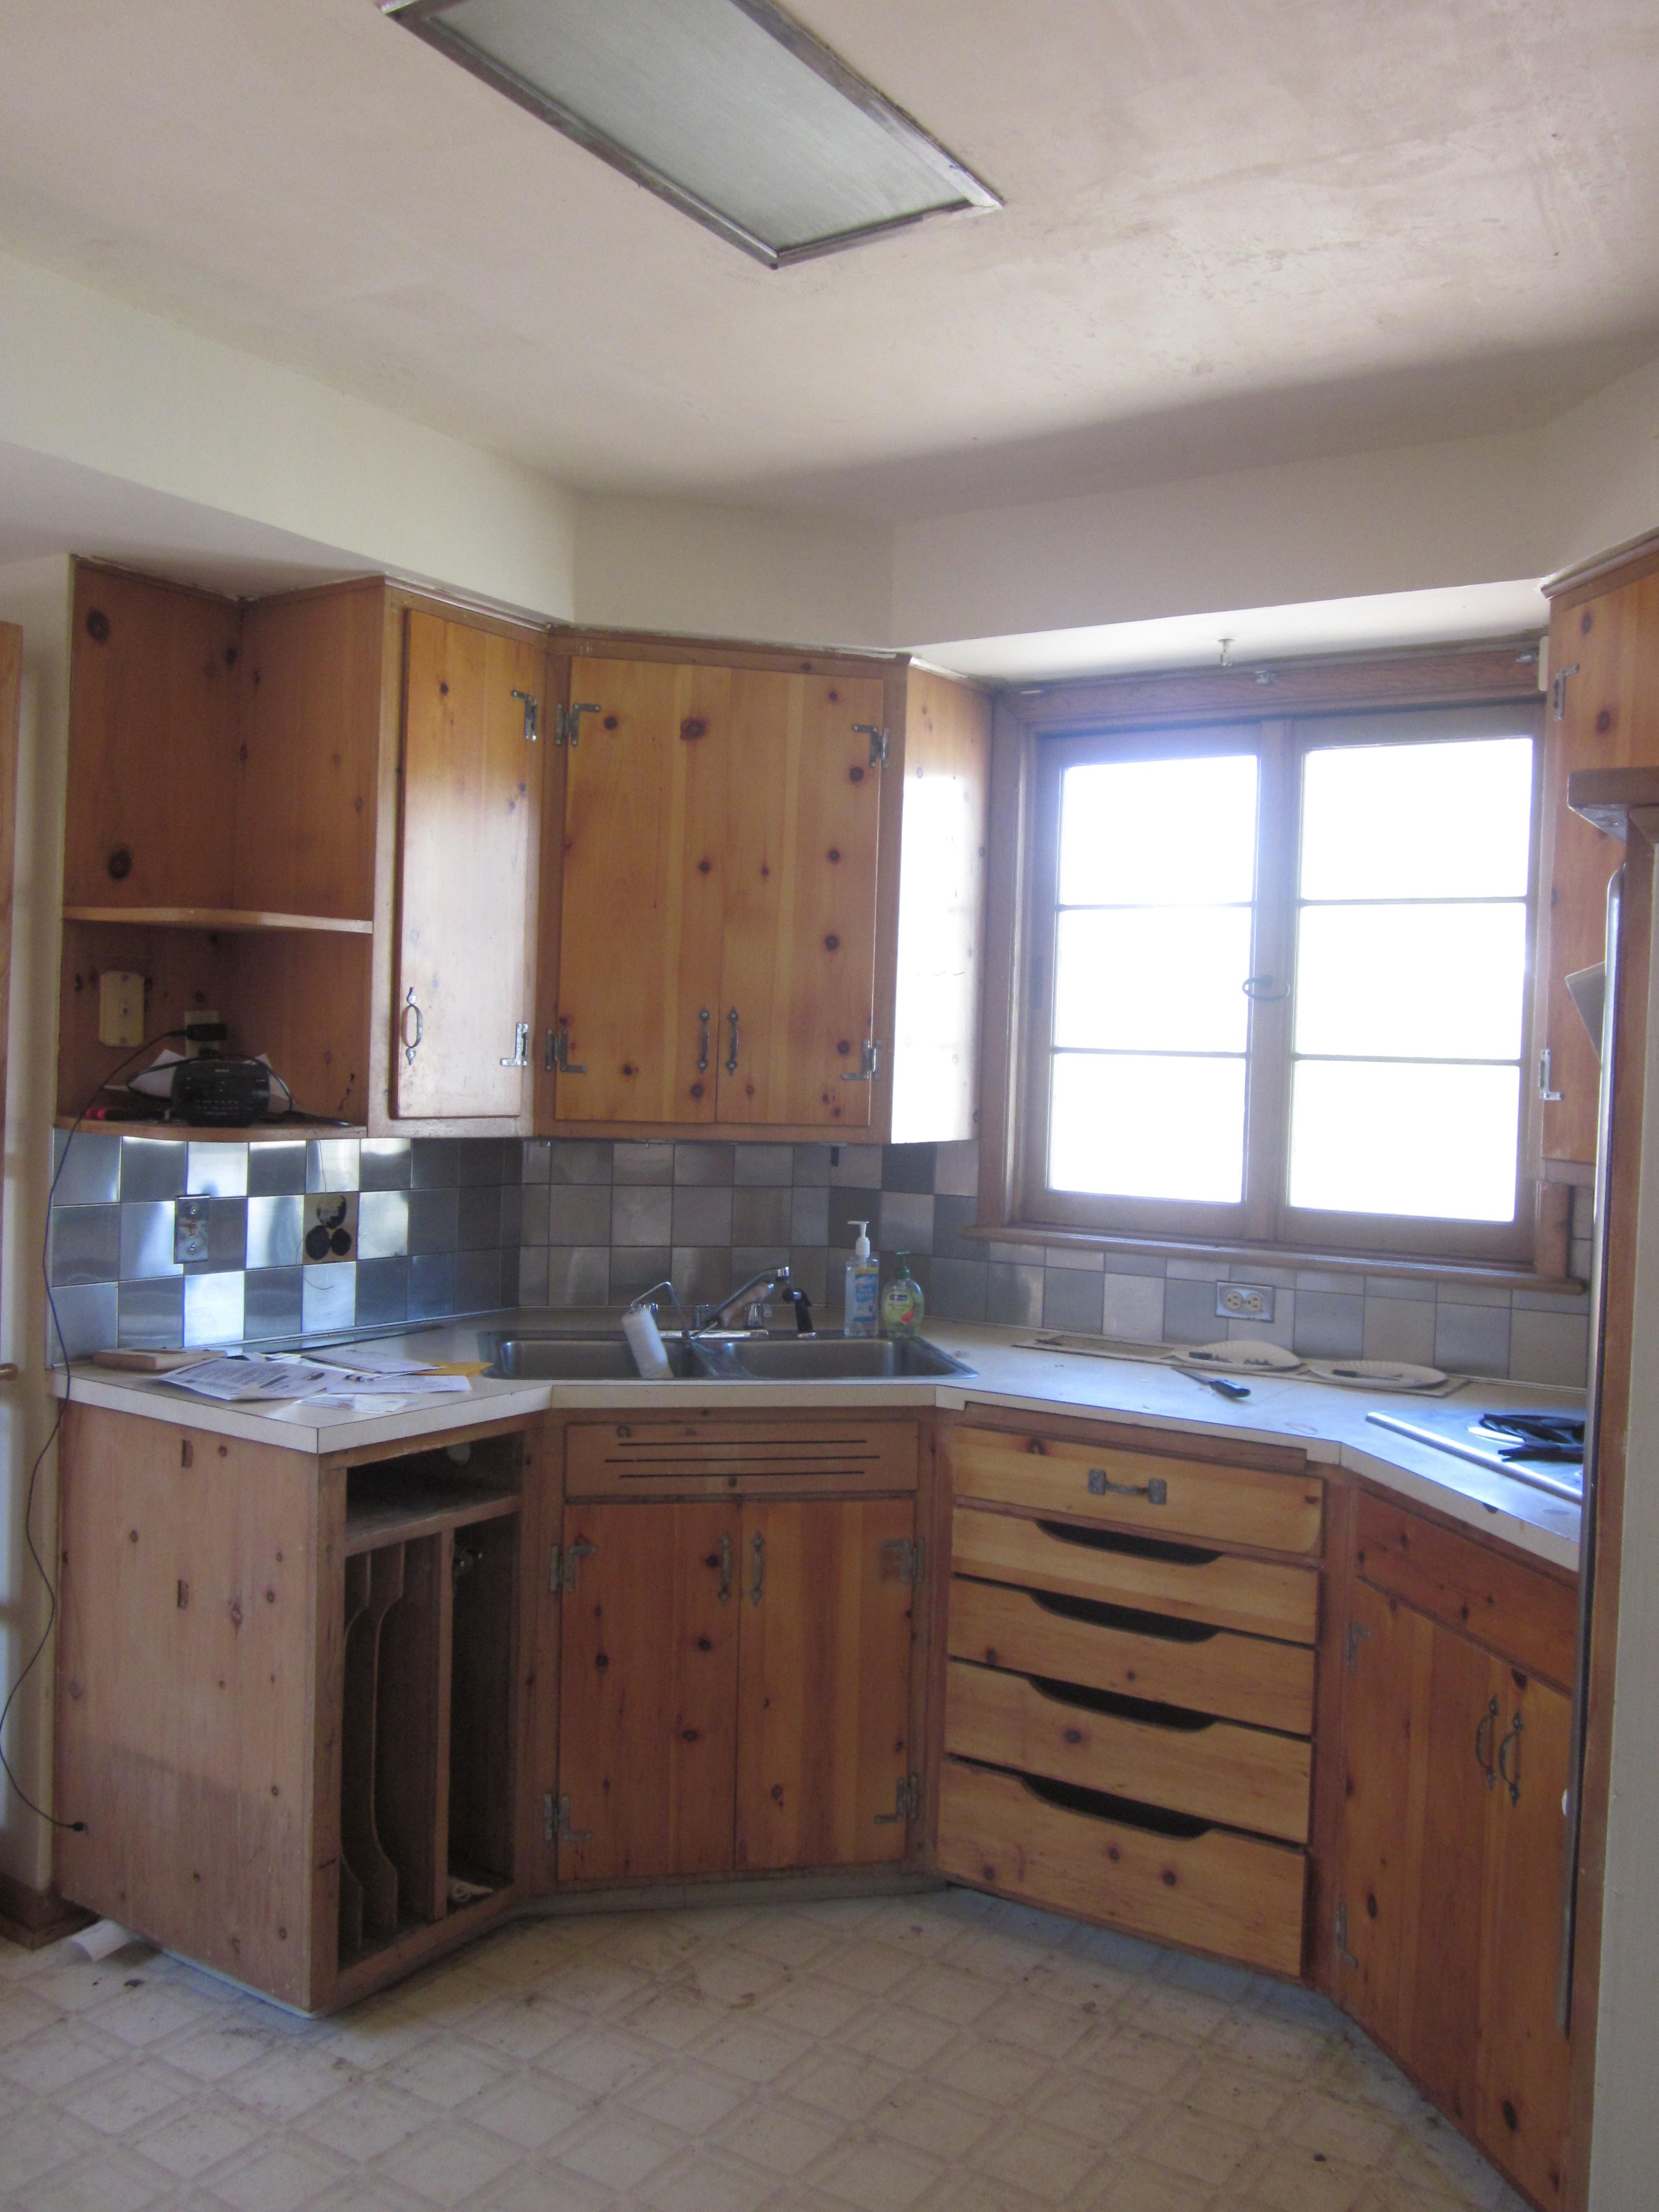 Knotty Pine Rooms: Kitchen1-5c4fe8405557223ac8b80cac22397c7b777226c3